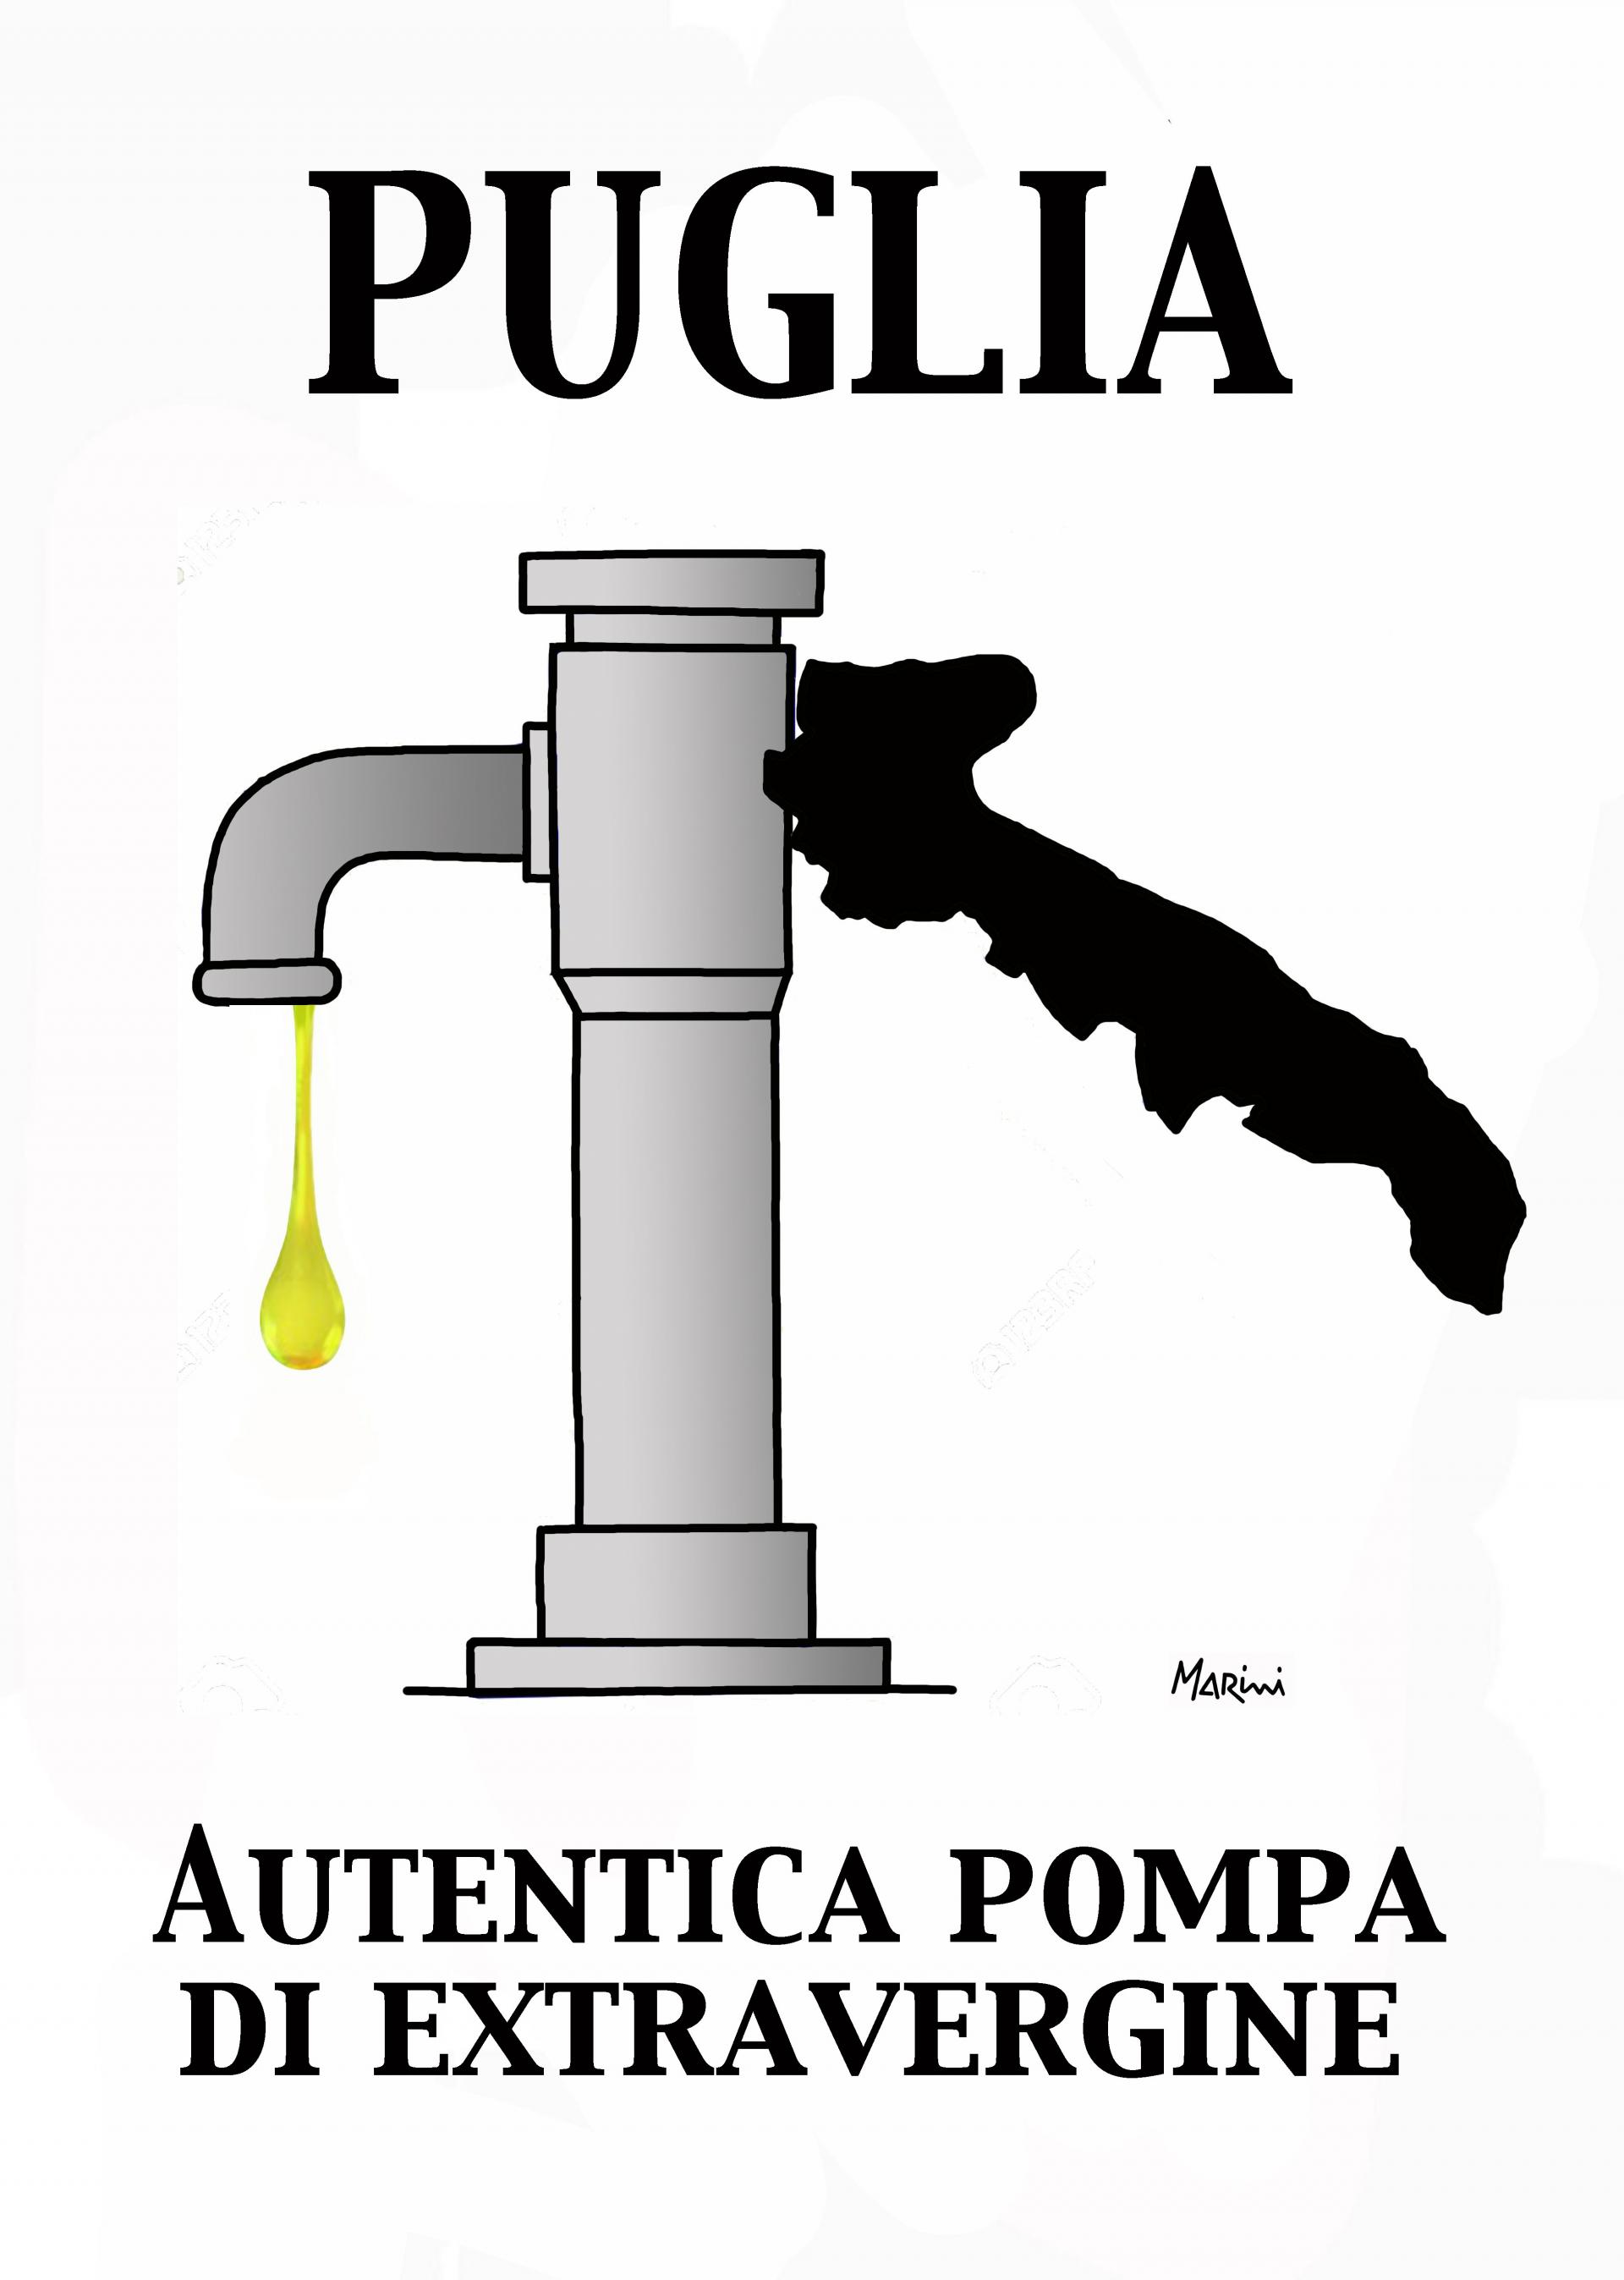 Se dici Puglia, dici olio